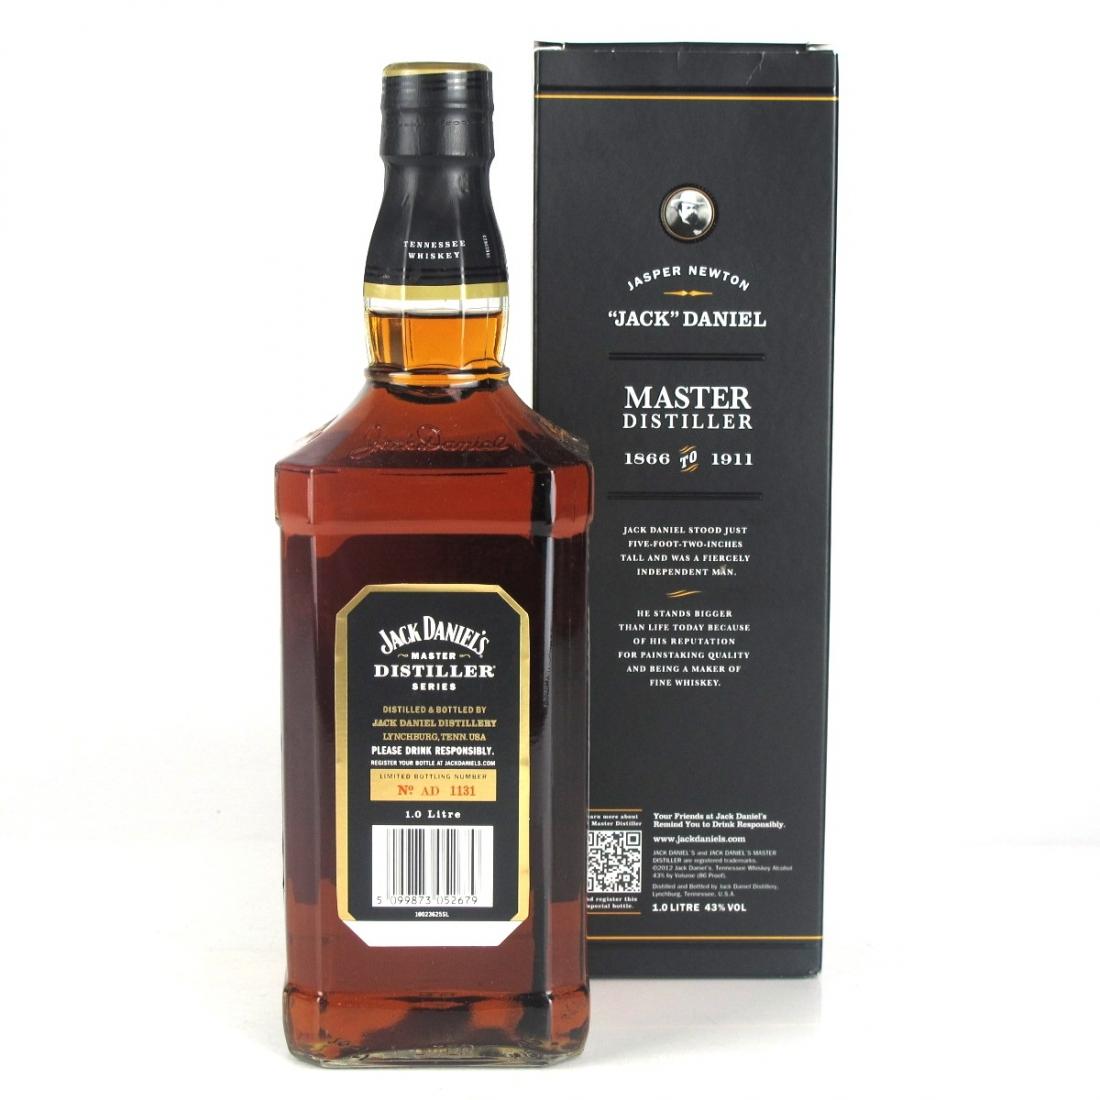 "Jack Daniel's Master Distiller Batch #1 / Jasper Newton ""Jack"" Daniel"